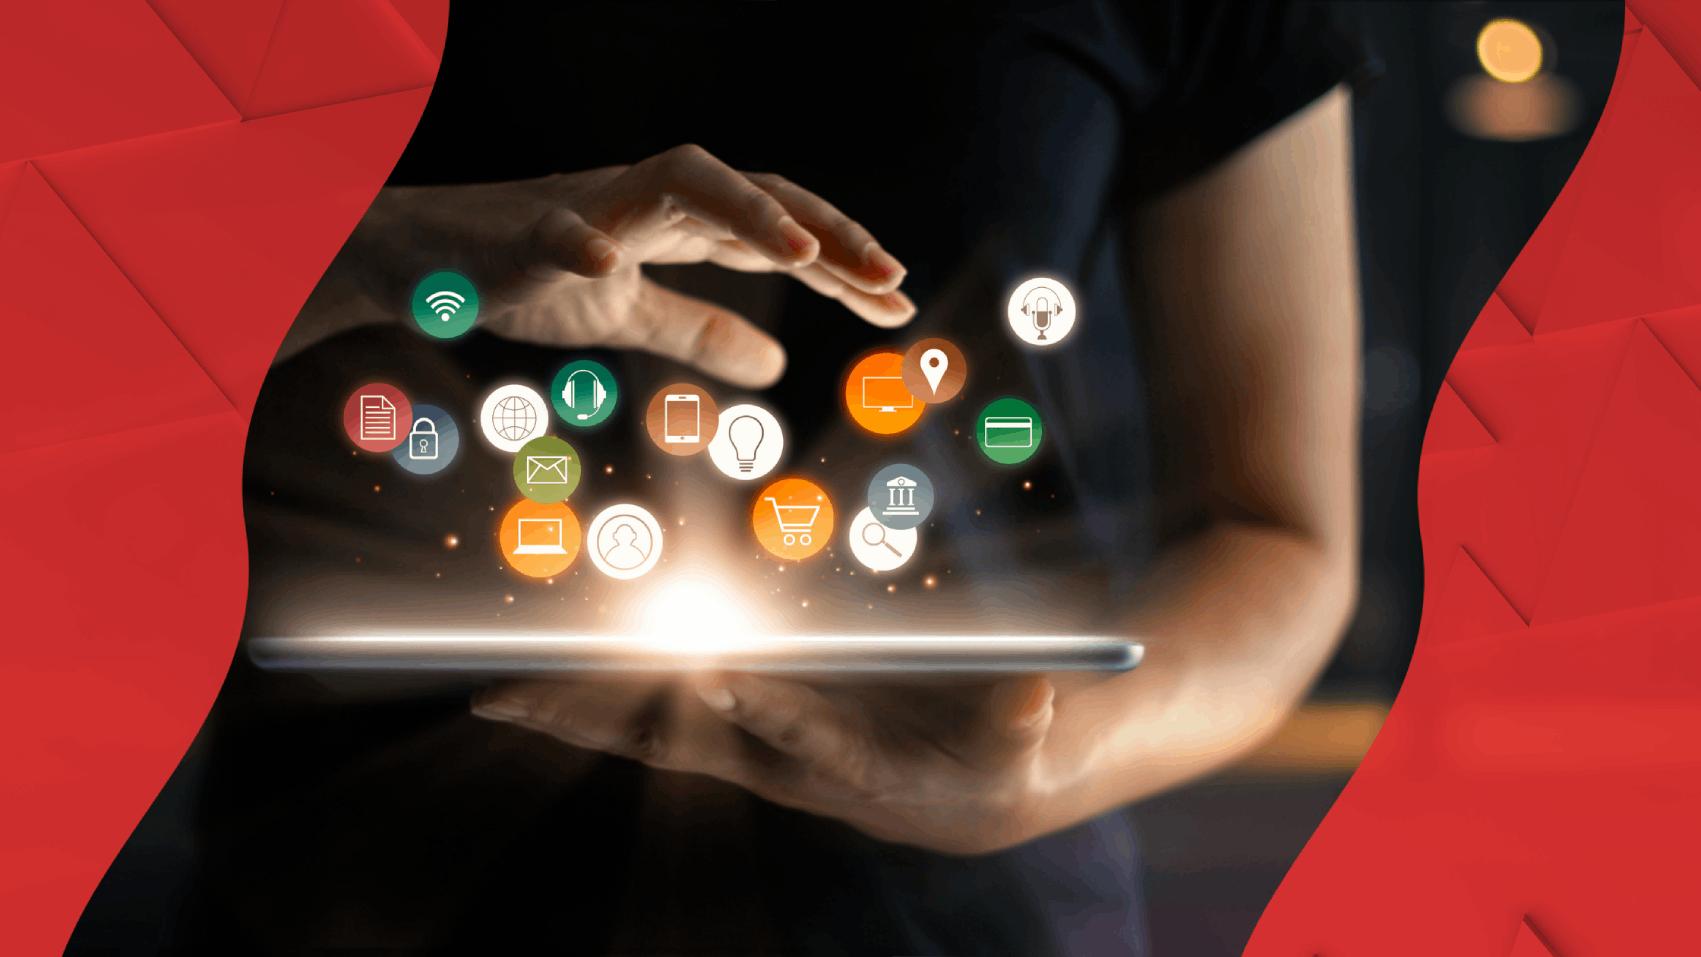 online applications on a tablet : bank van breda and hubspot